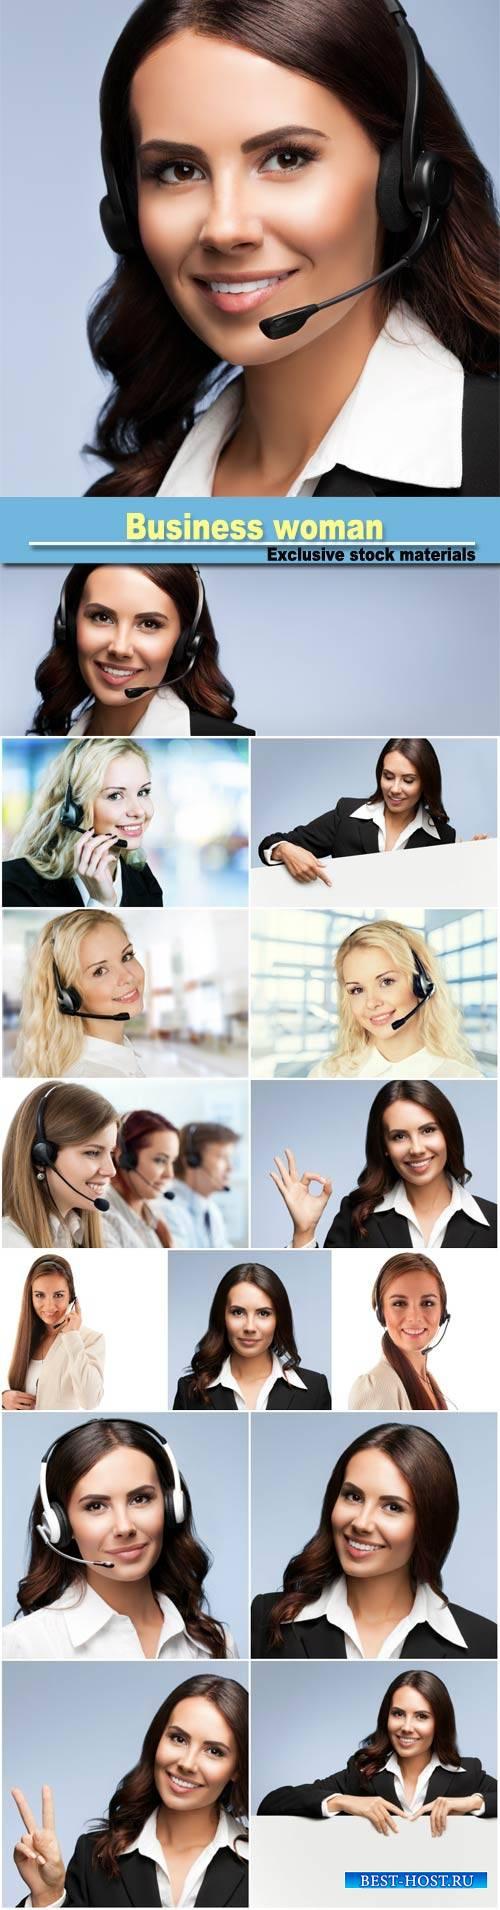 Business woman, women operators